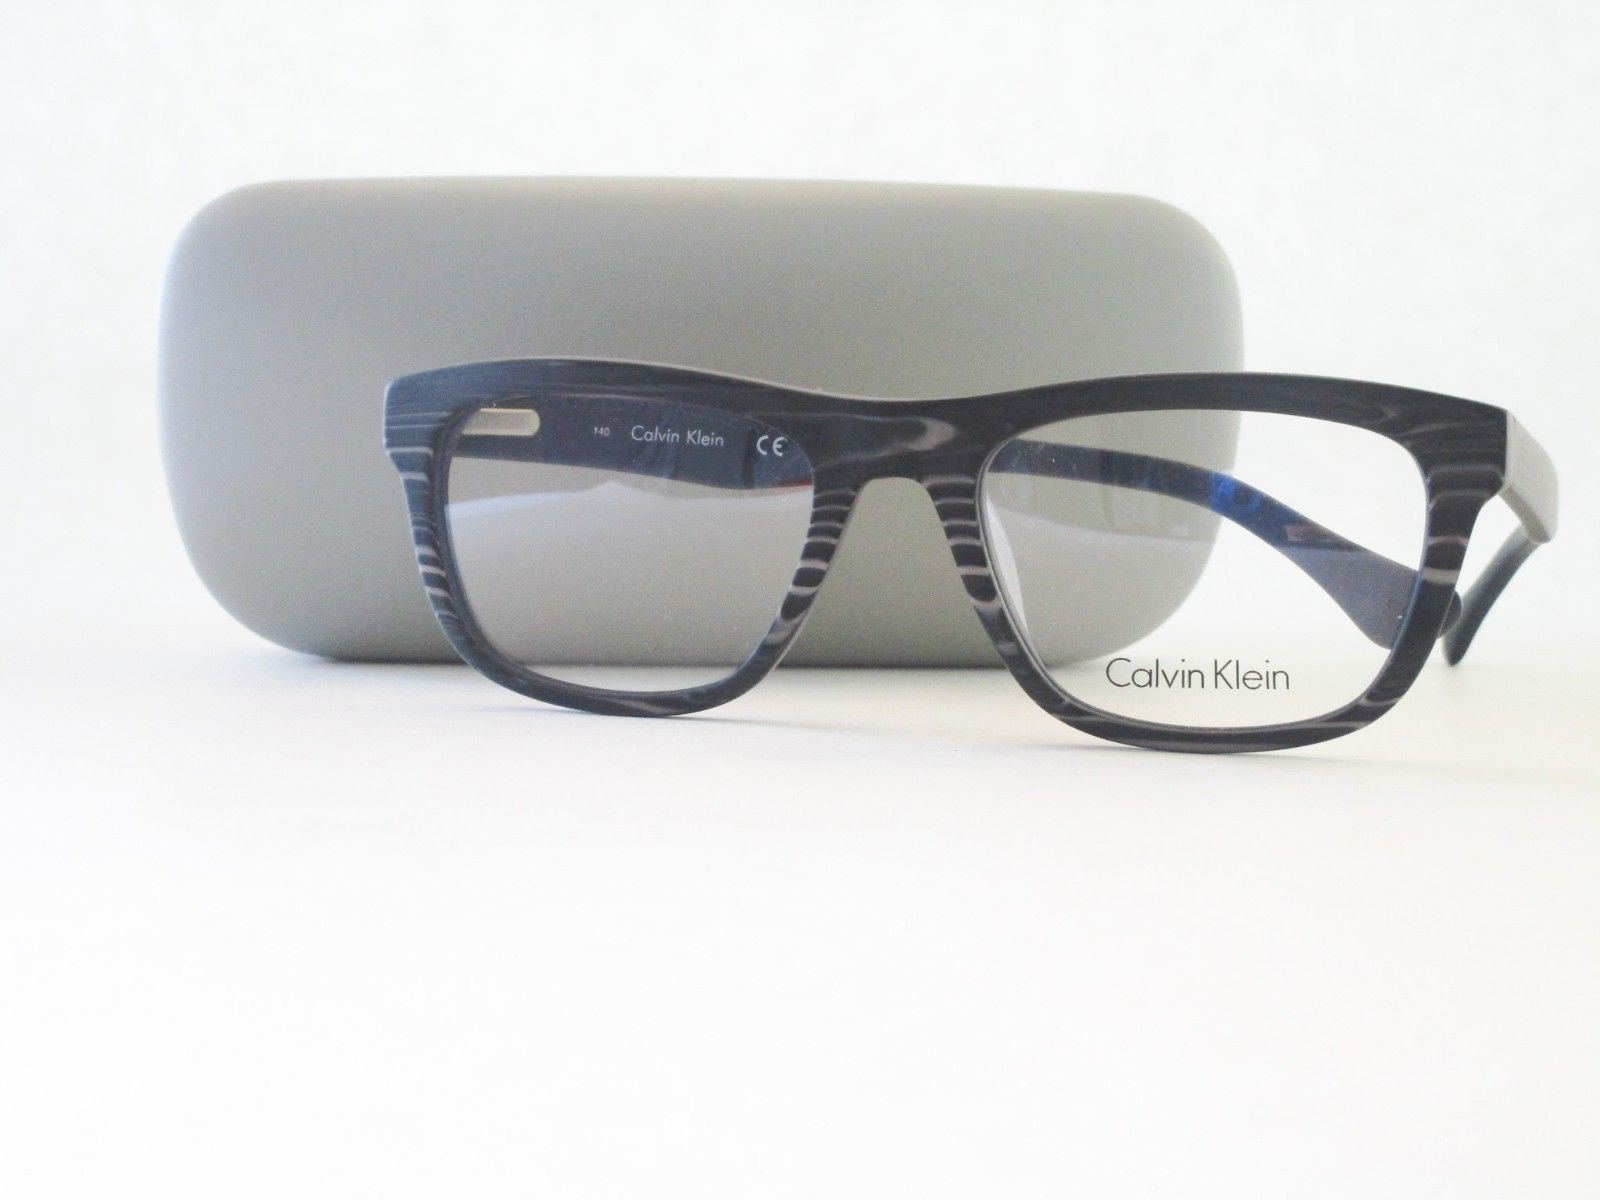 6460dd24b6b Calvin Klein CK5886 278 Optical Frame and 50 similar items